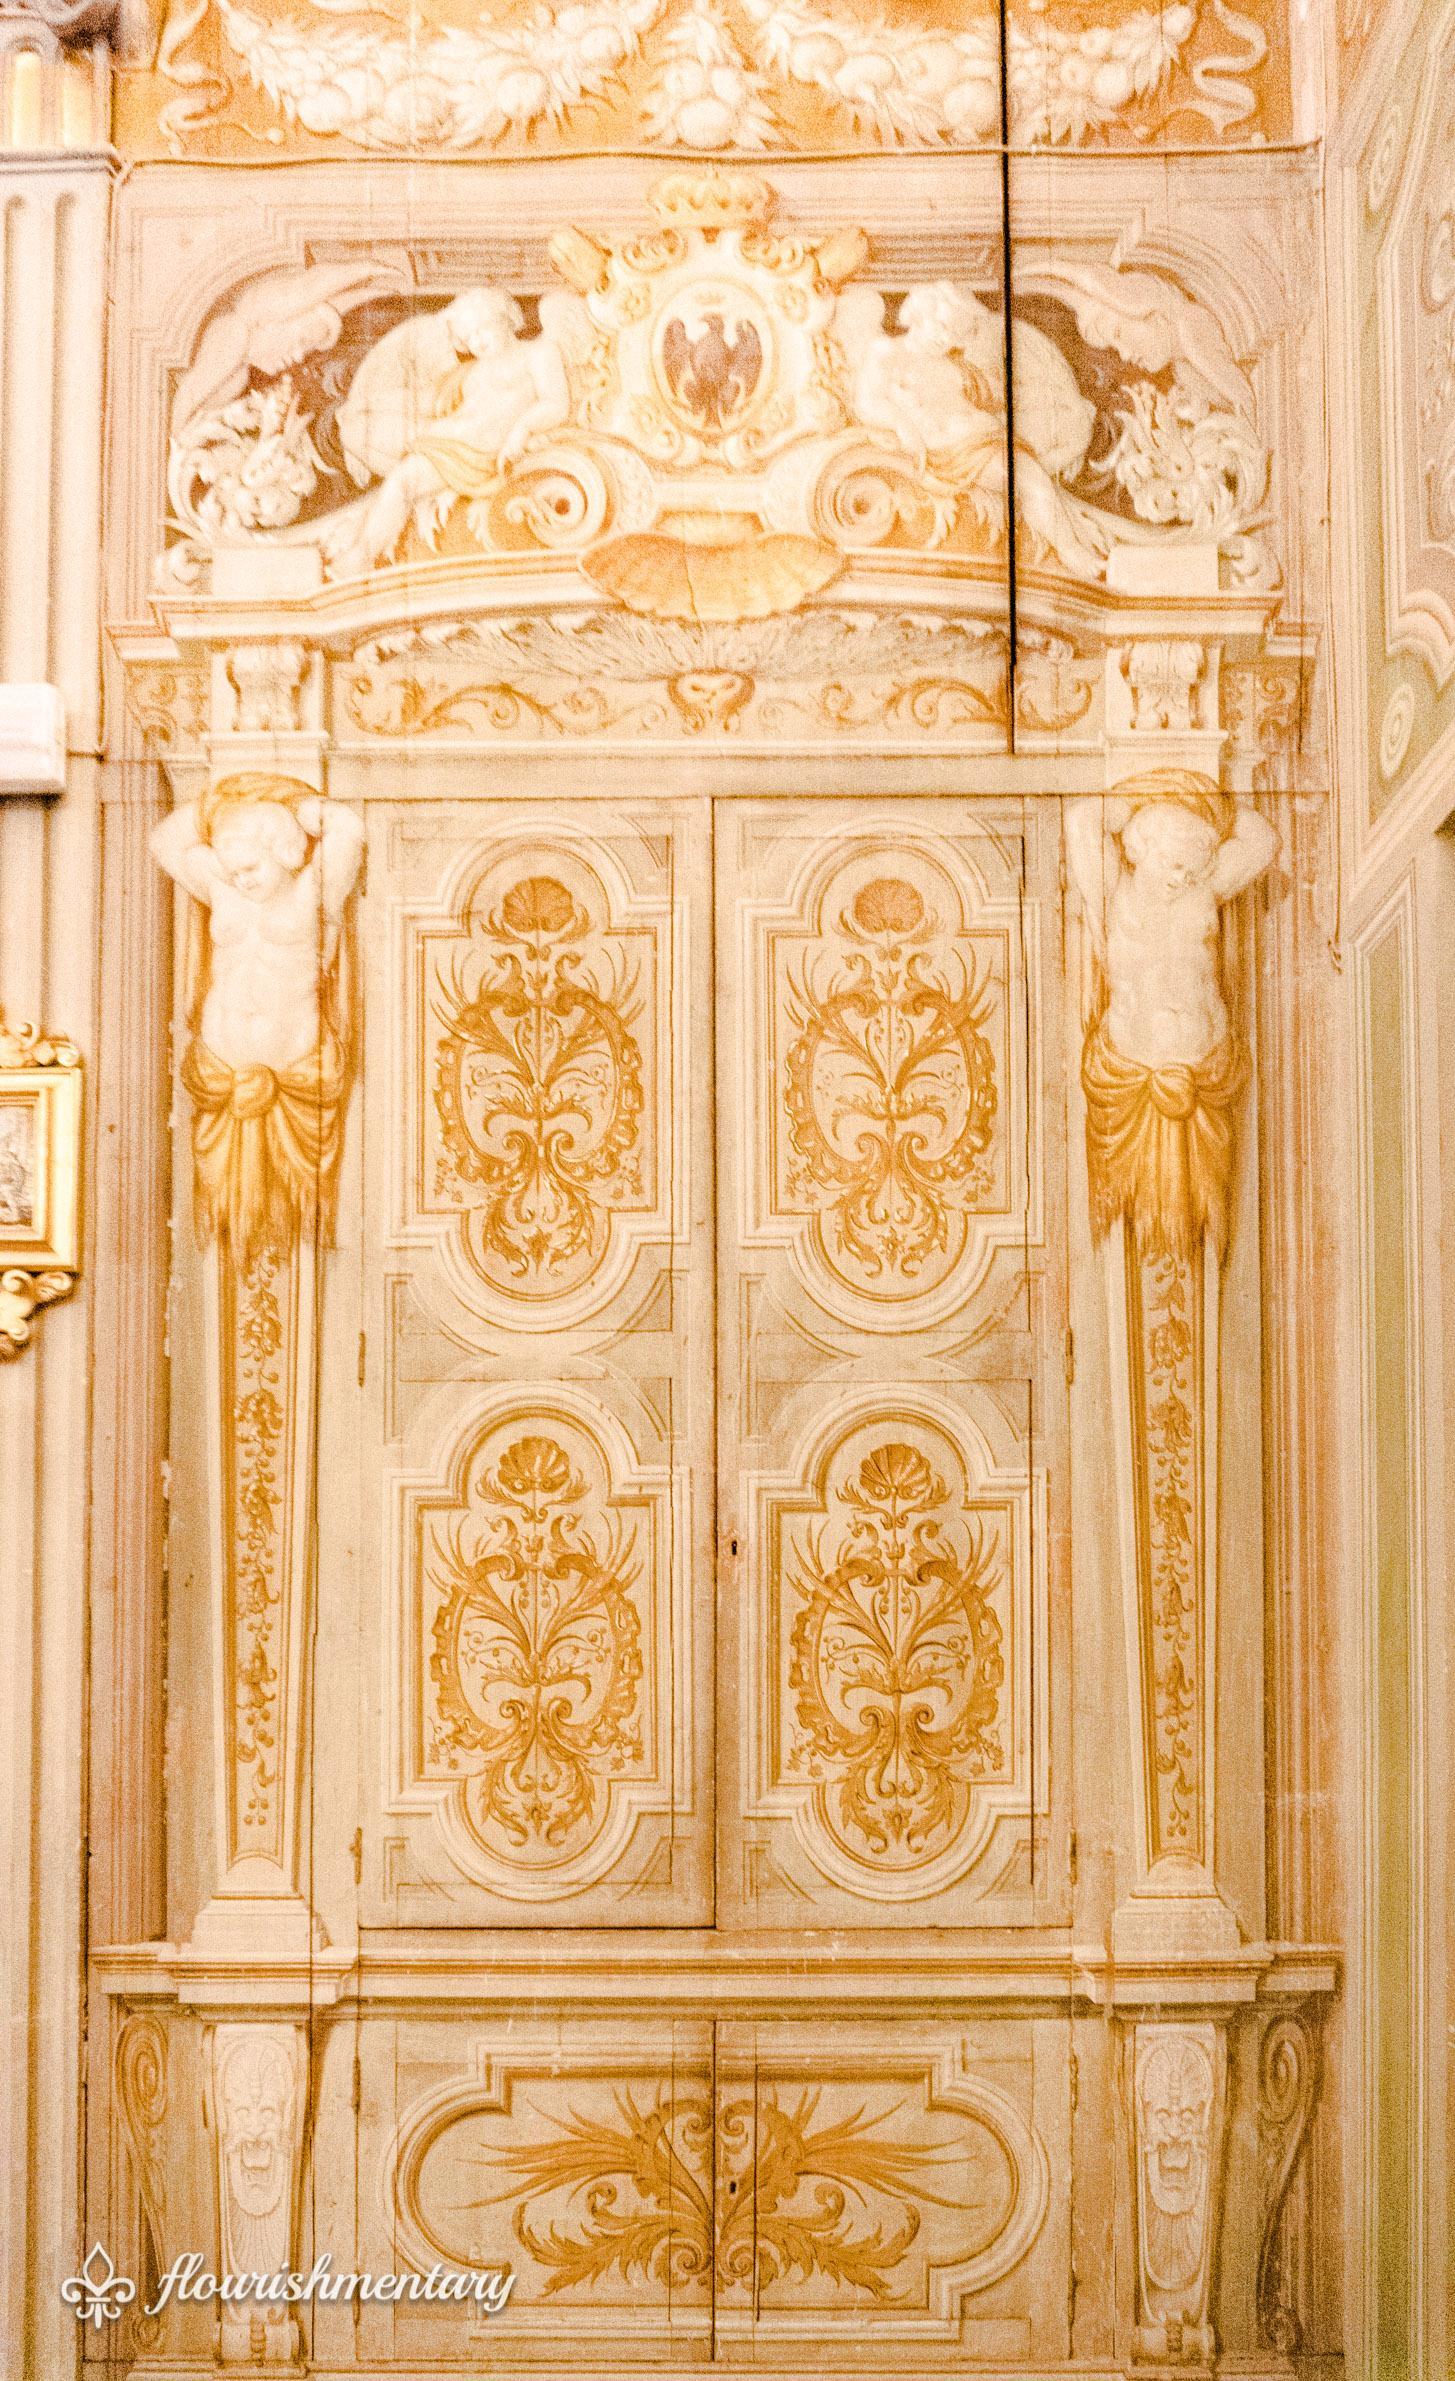 Decorative details of the family chapel Galleria Doria Pamphilj